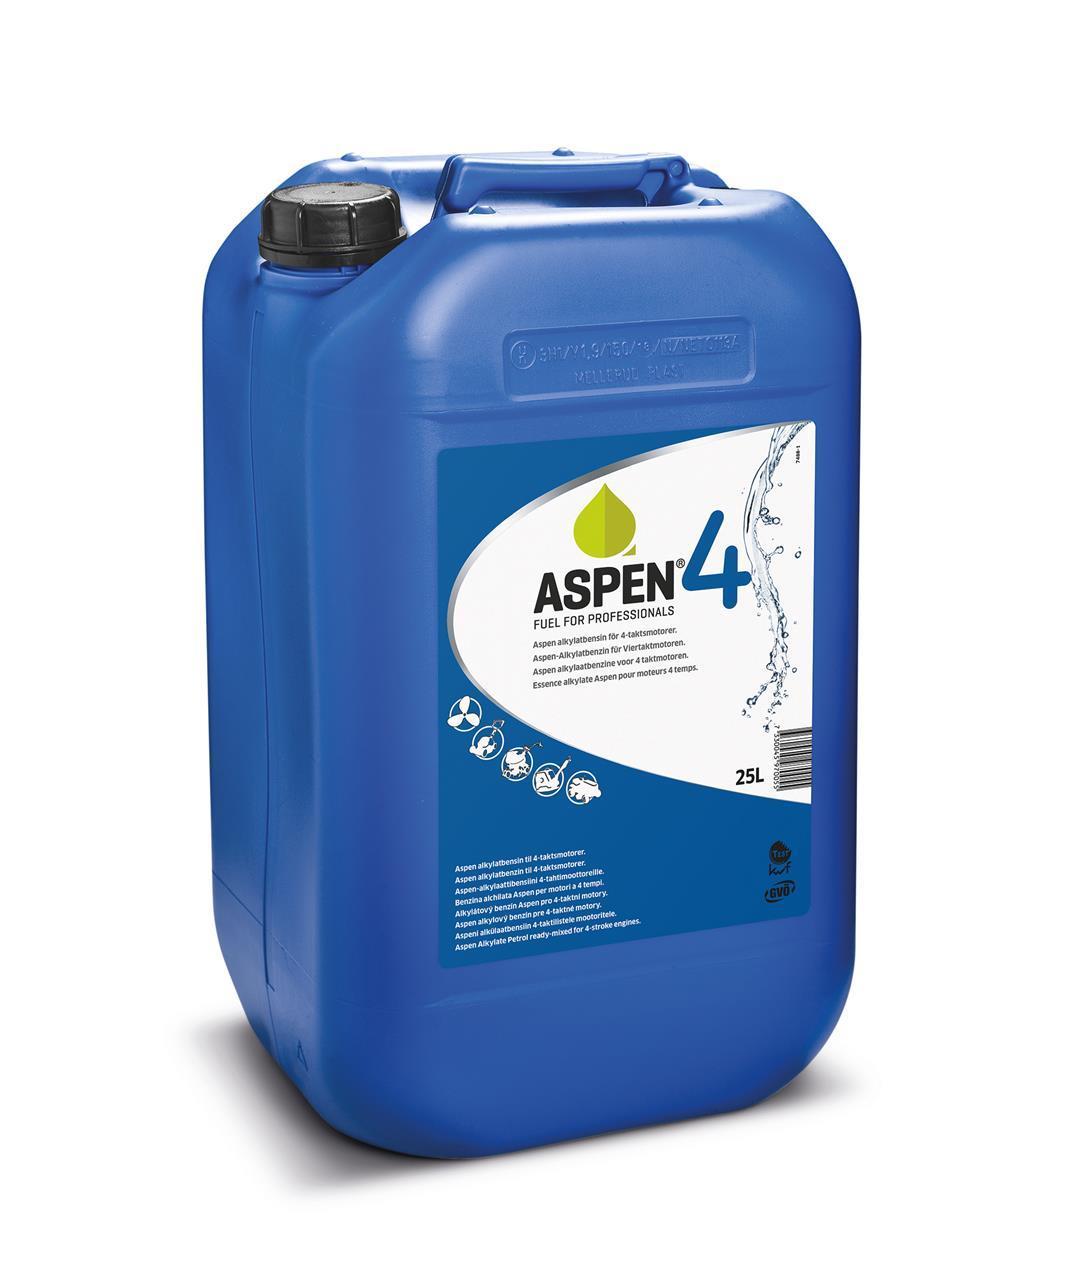 Aspen4 25L